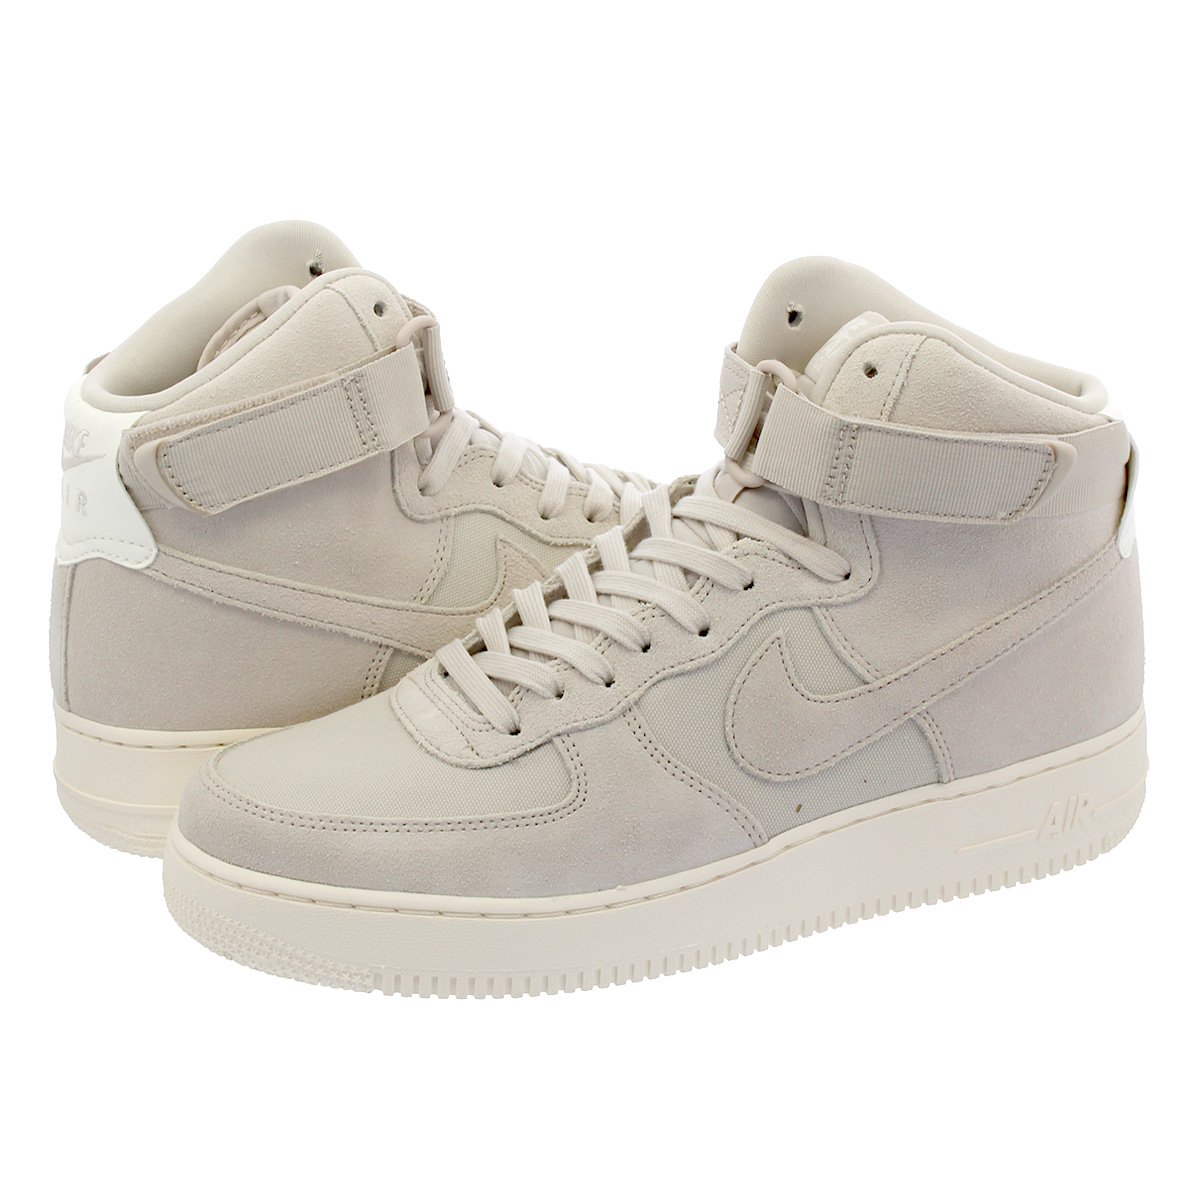 super popular 64b89 b14ae SELECT SHOP LOWTEX  NIKE AIR FORCE 1 HIGH 07 SUEDE Nike air force 1 high 07  suede BEIGE CREAM WHITE WHITE aq8649-001   Rakuten Global Market